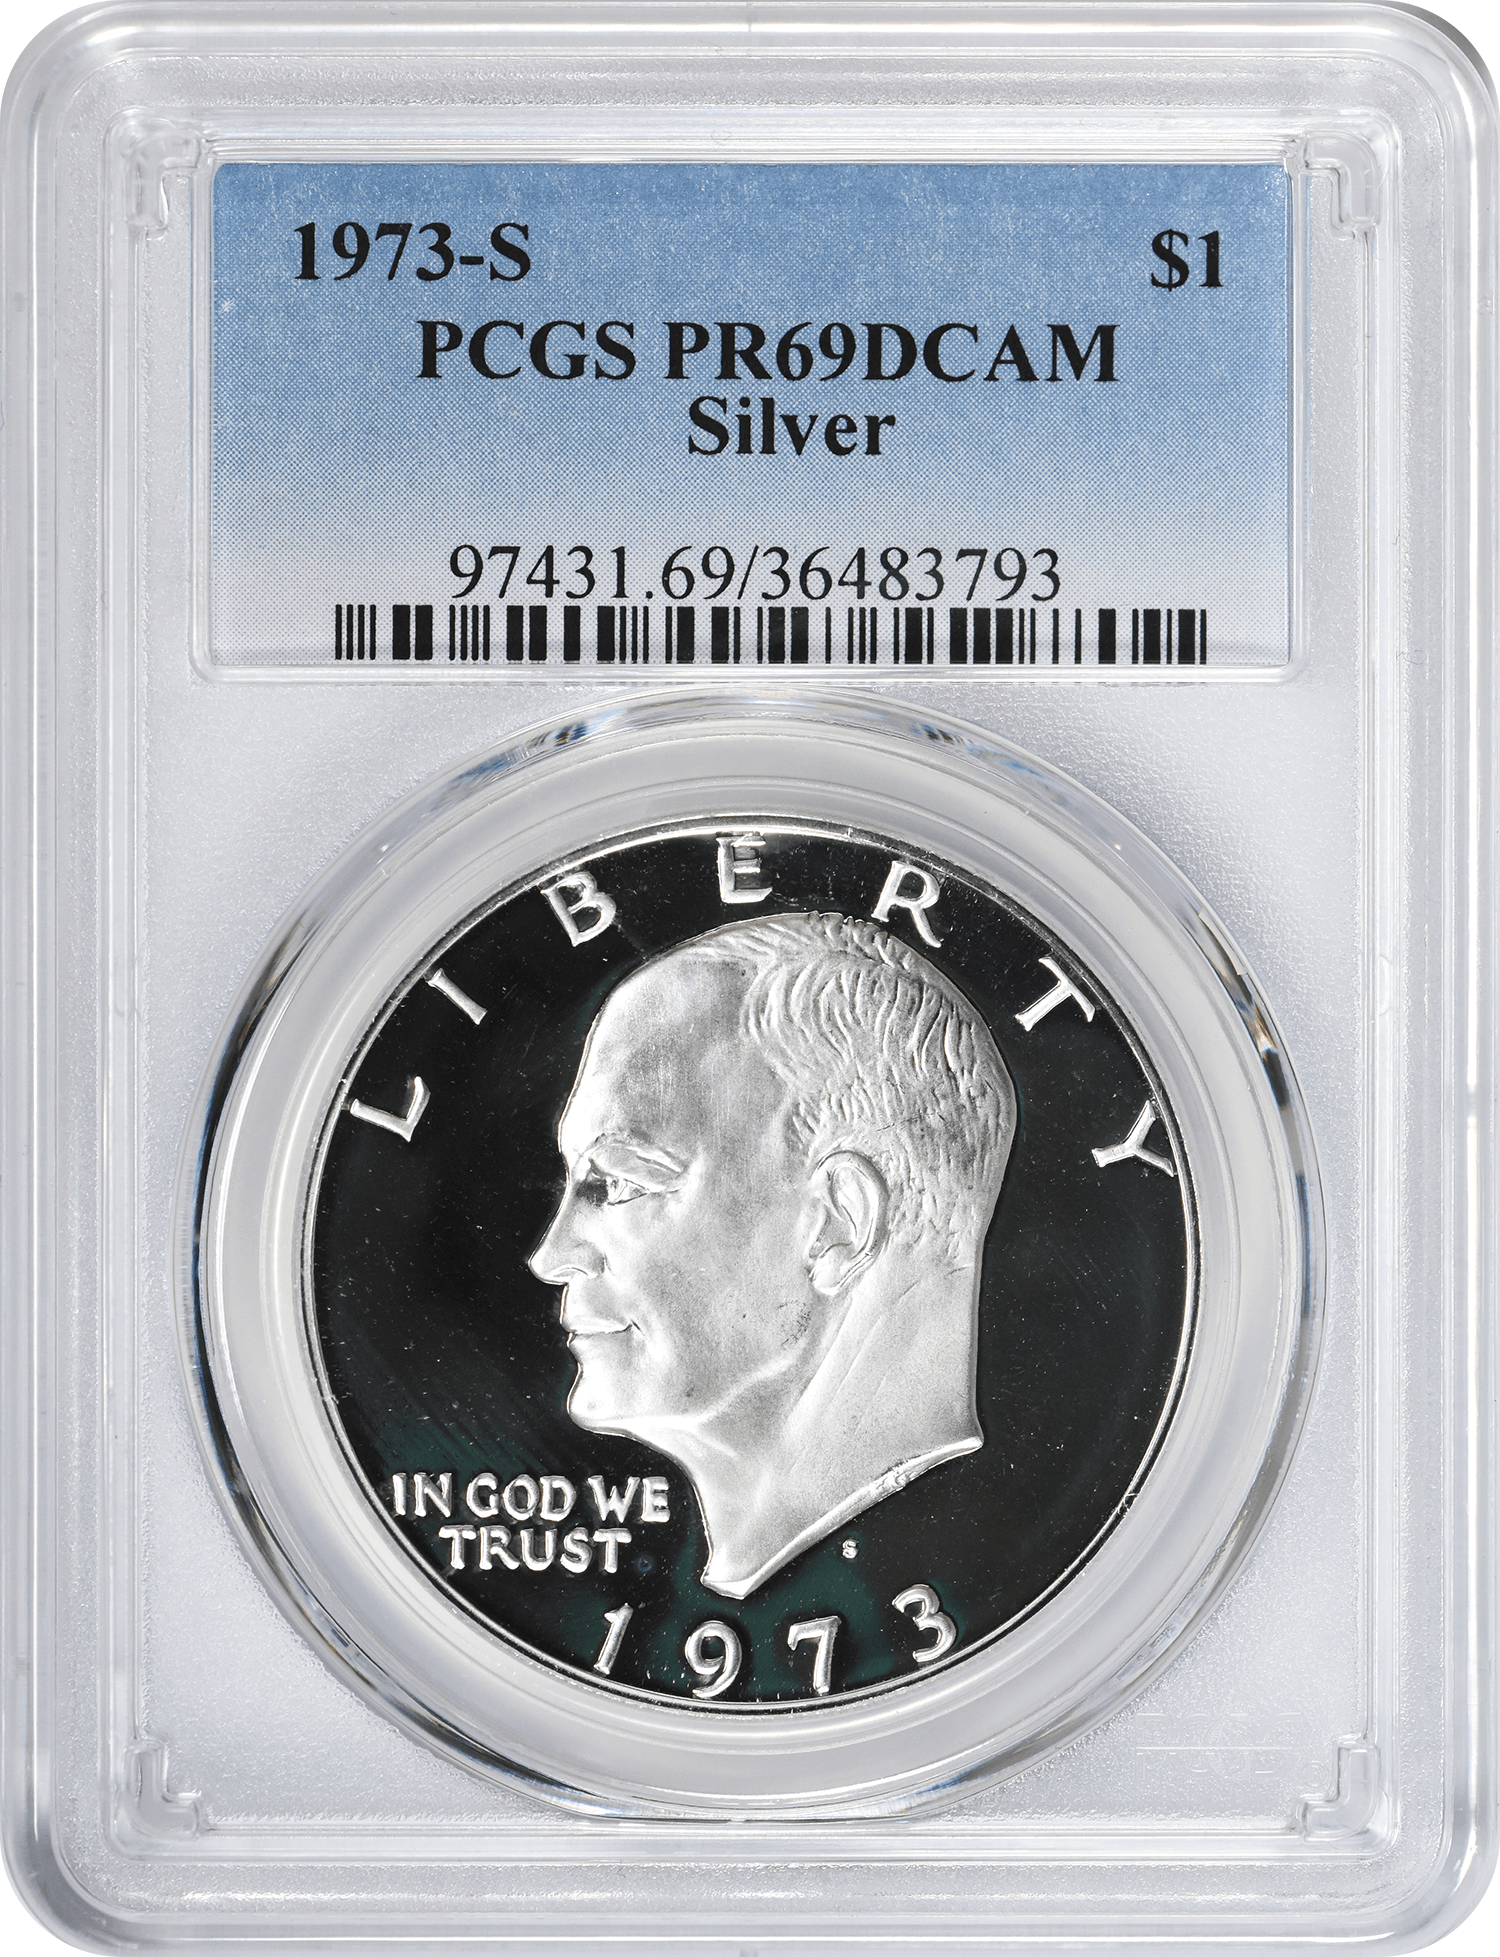 1973-S Eisenhower Dollar, PR69DCAM, Silver, PCGS